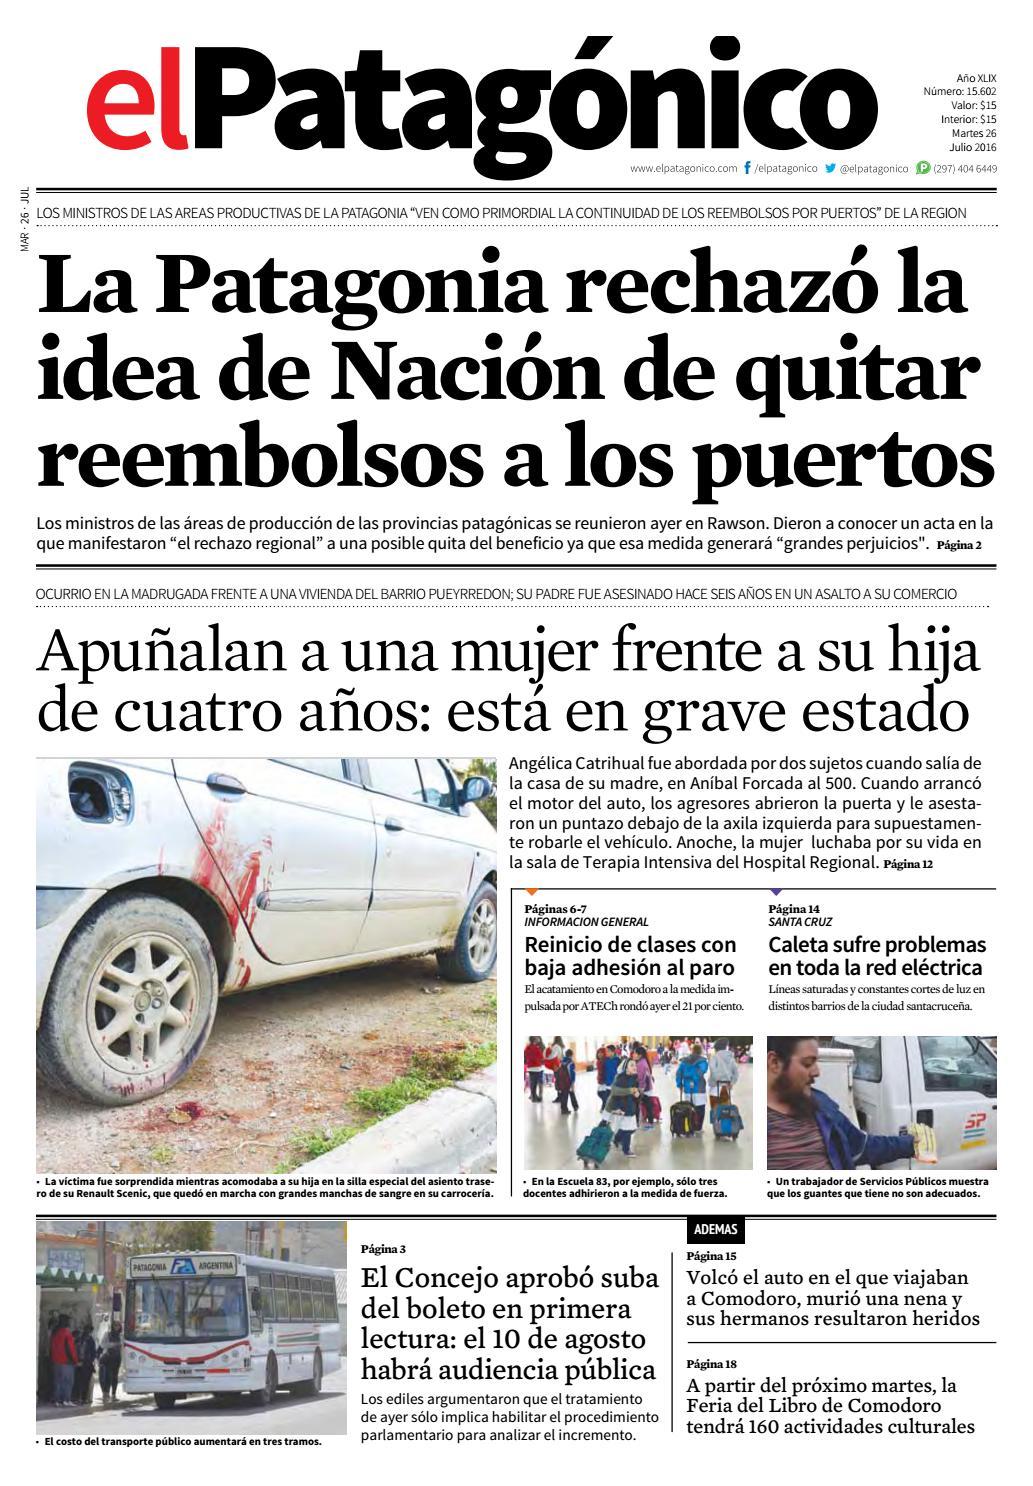 edicion223325072016.pdf by El Patagonico - issuu